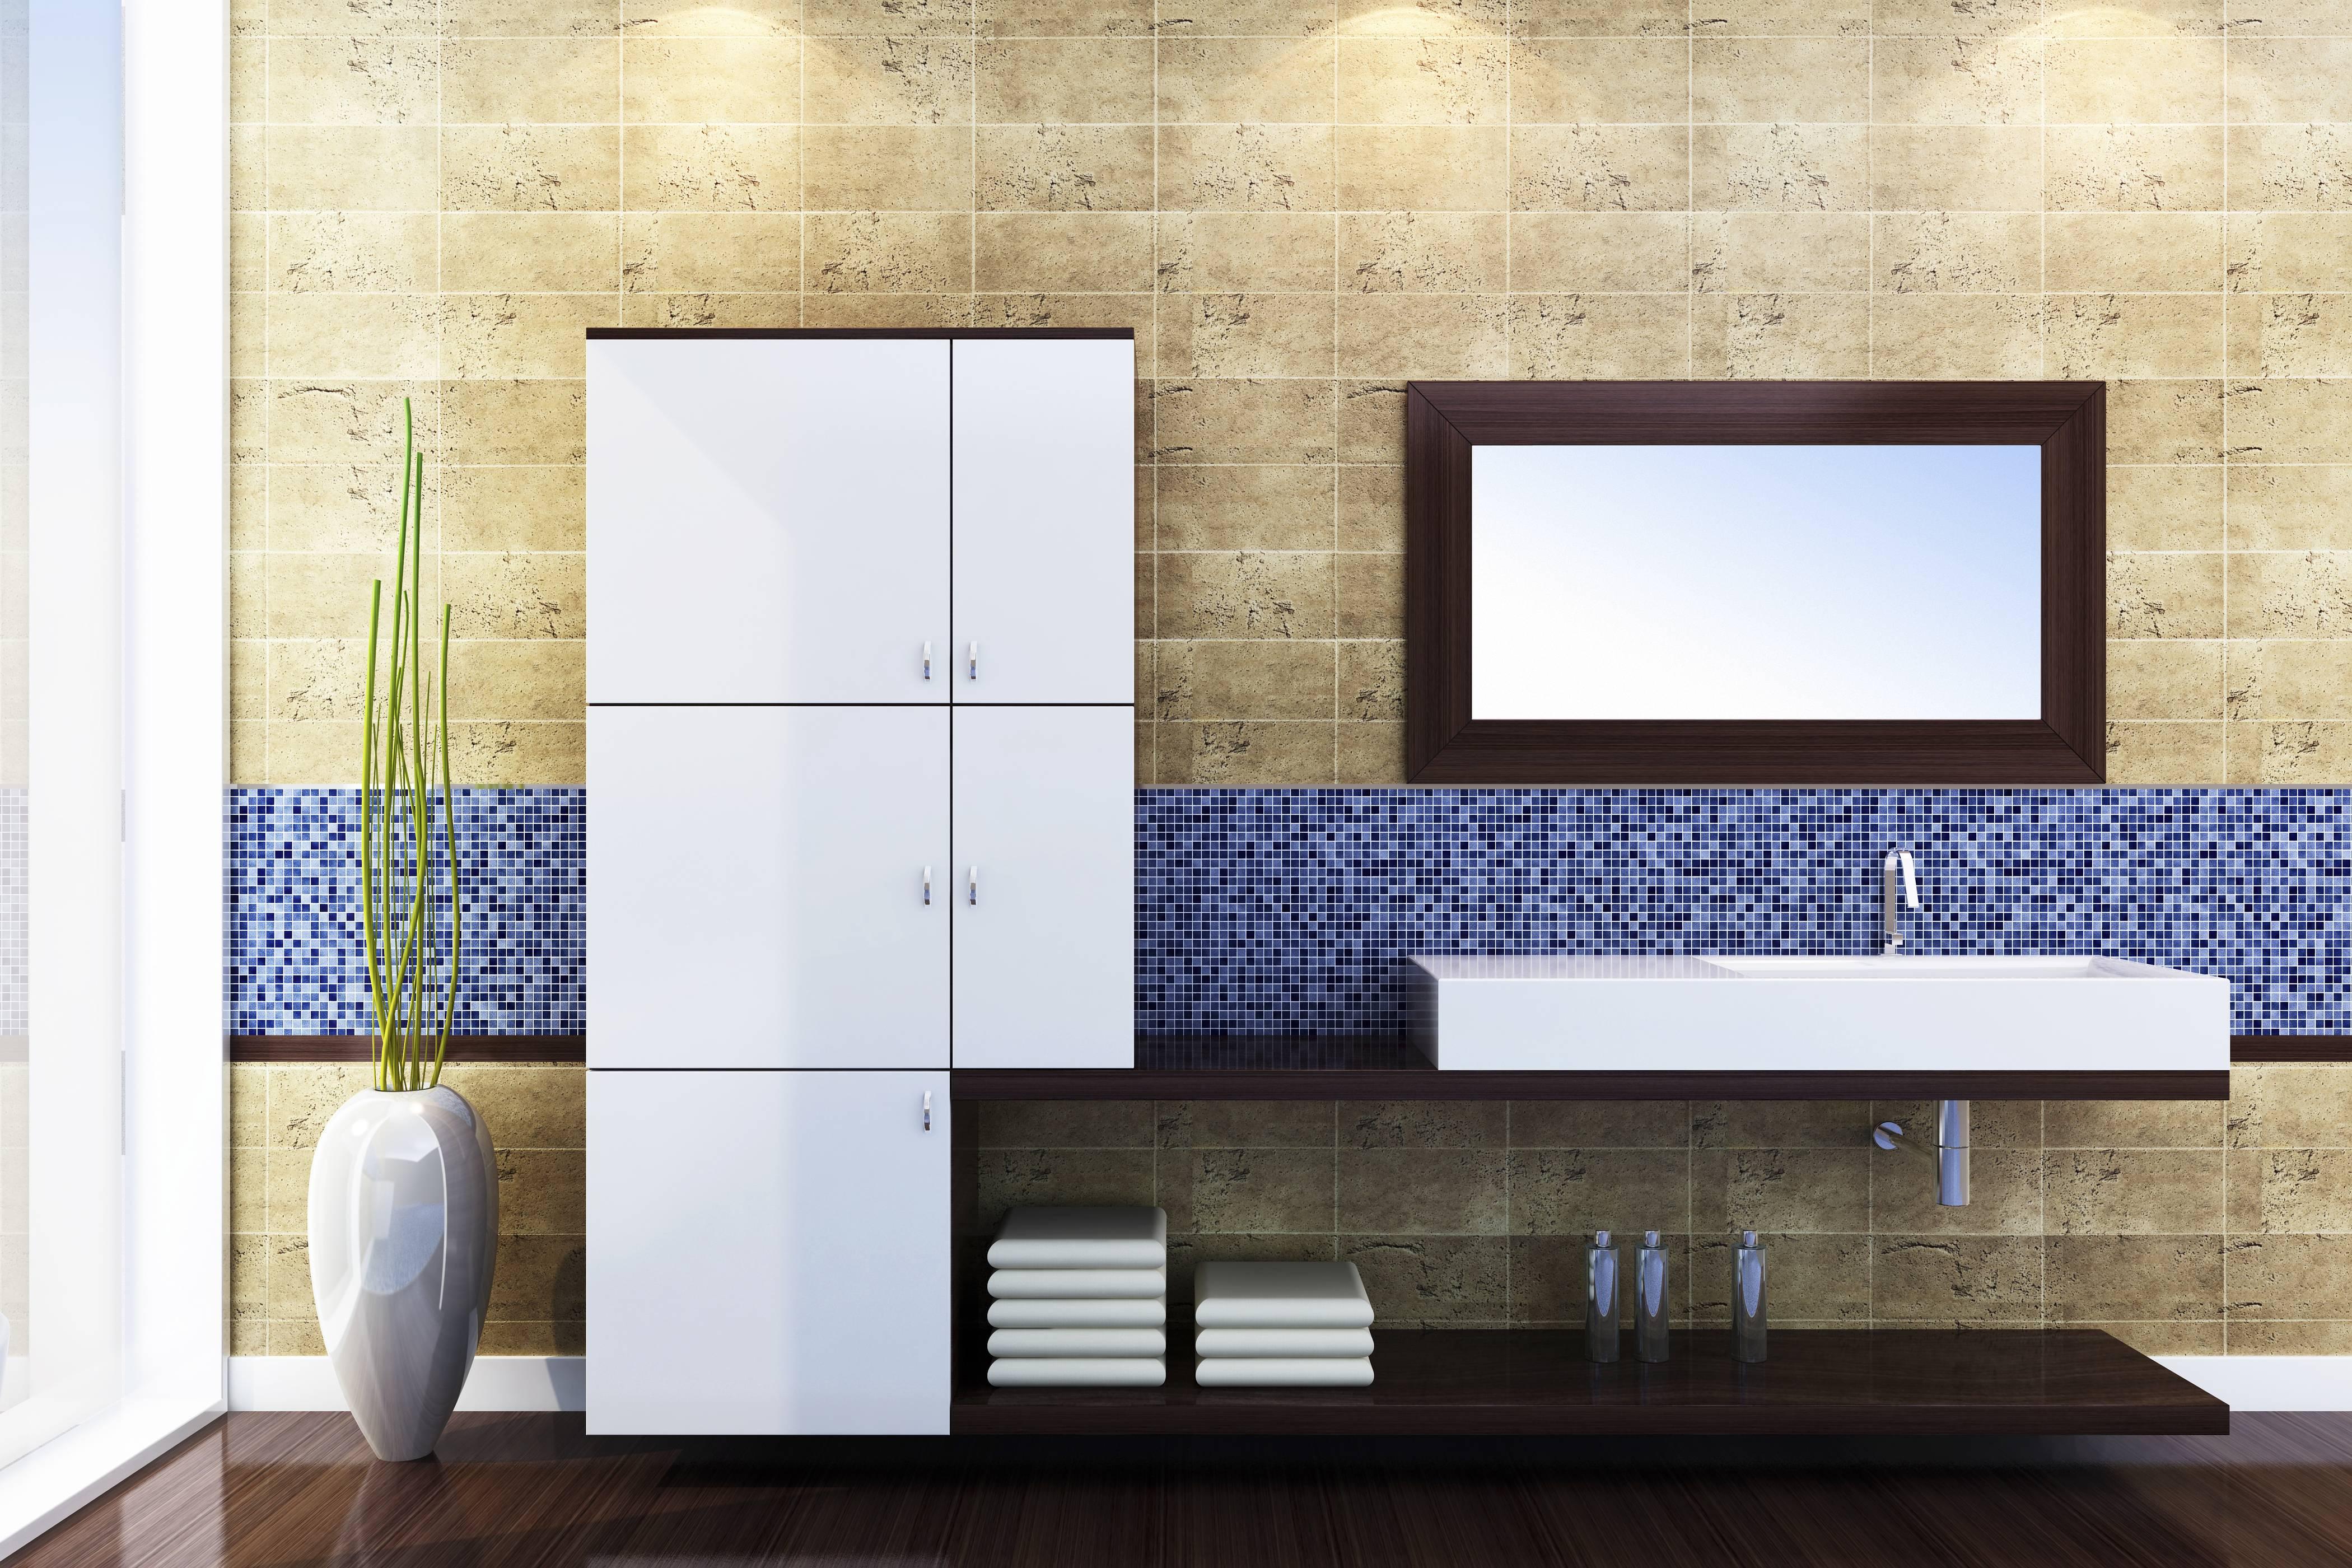 Pharmacie Salle De Bain Kijiji ~ armoire designe armoire salle de bain a vendre quebec pharmacie de